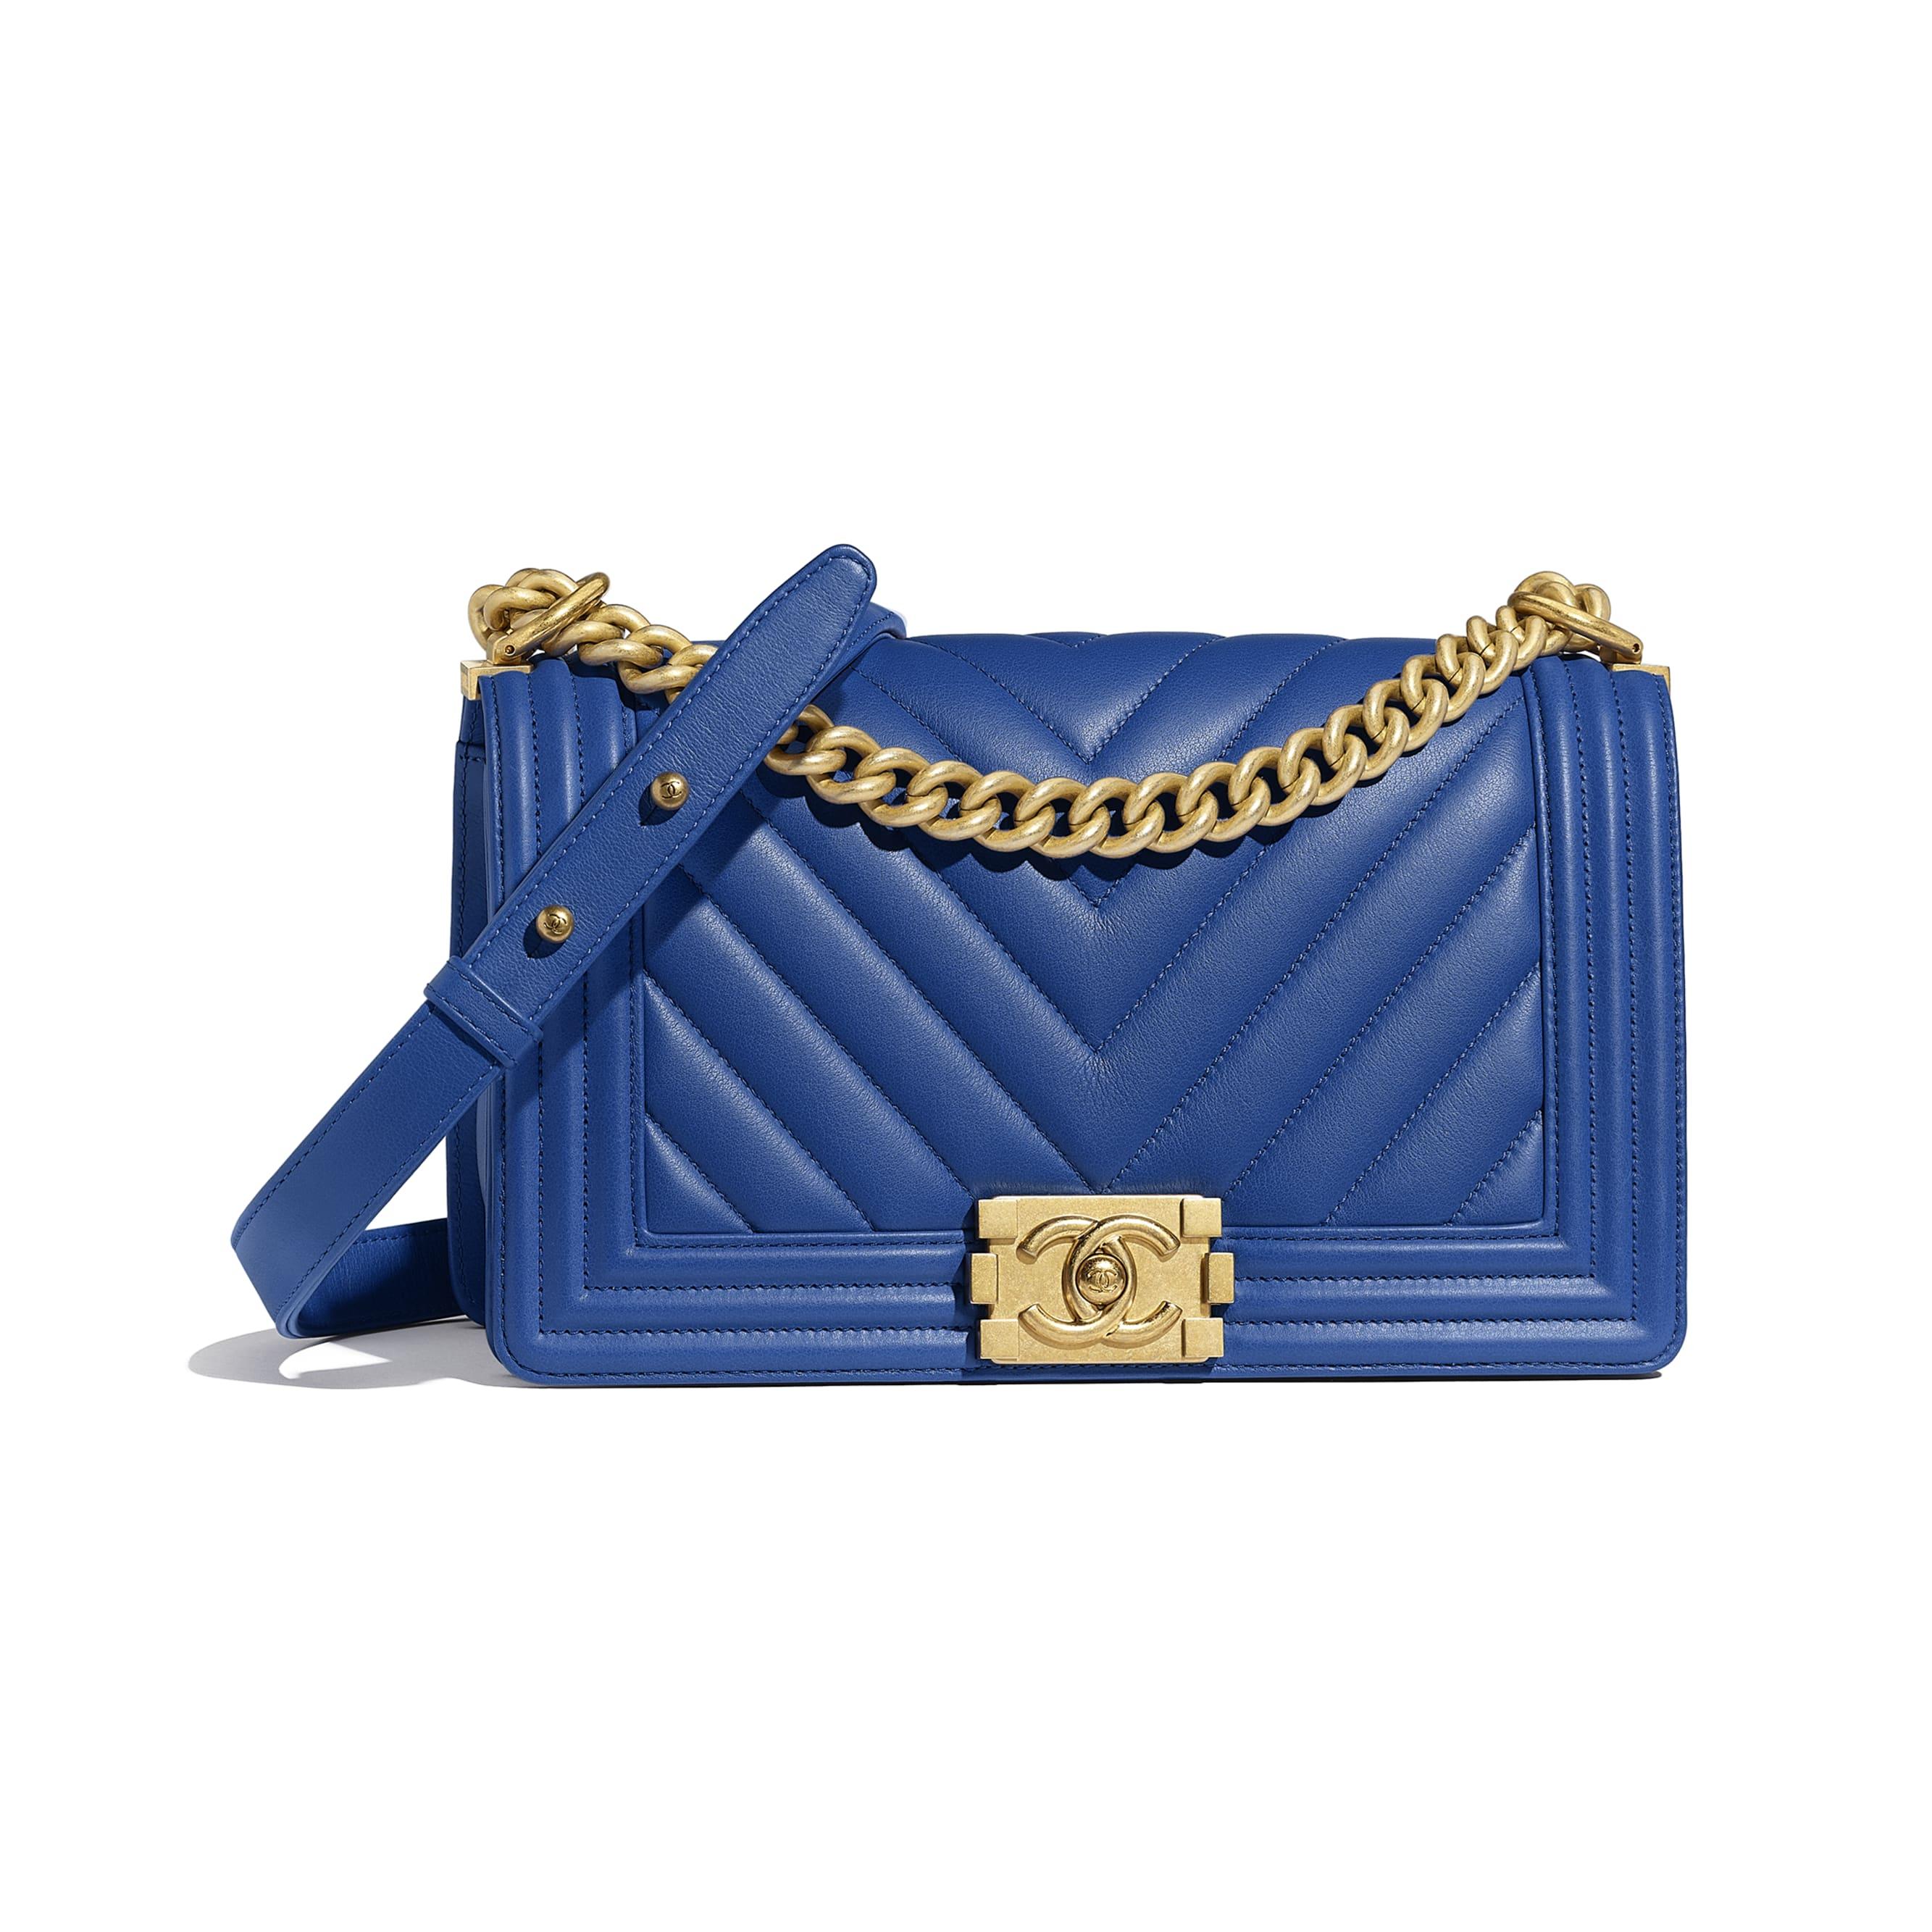 11be8f09166c ... BOY CHANEL Handbag - Dark Blue - Calfskin   Gold-Tone Metal - Default  view